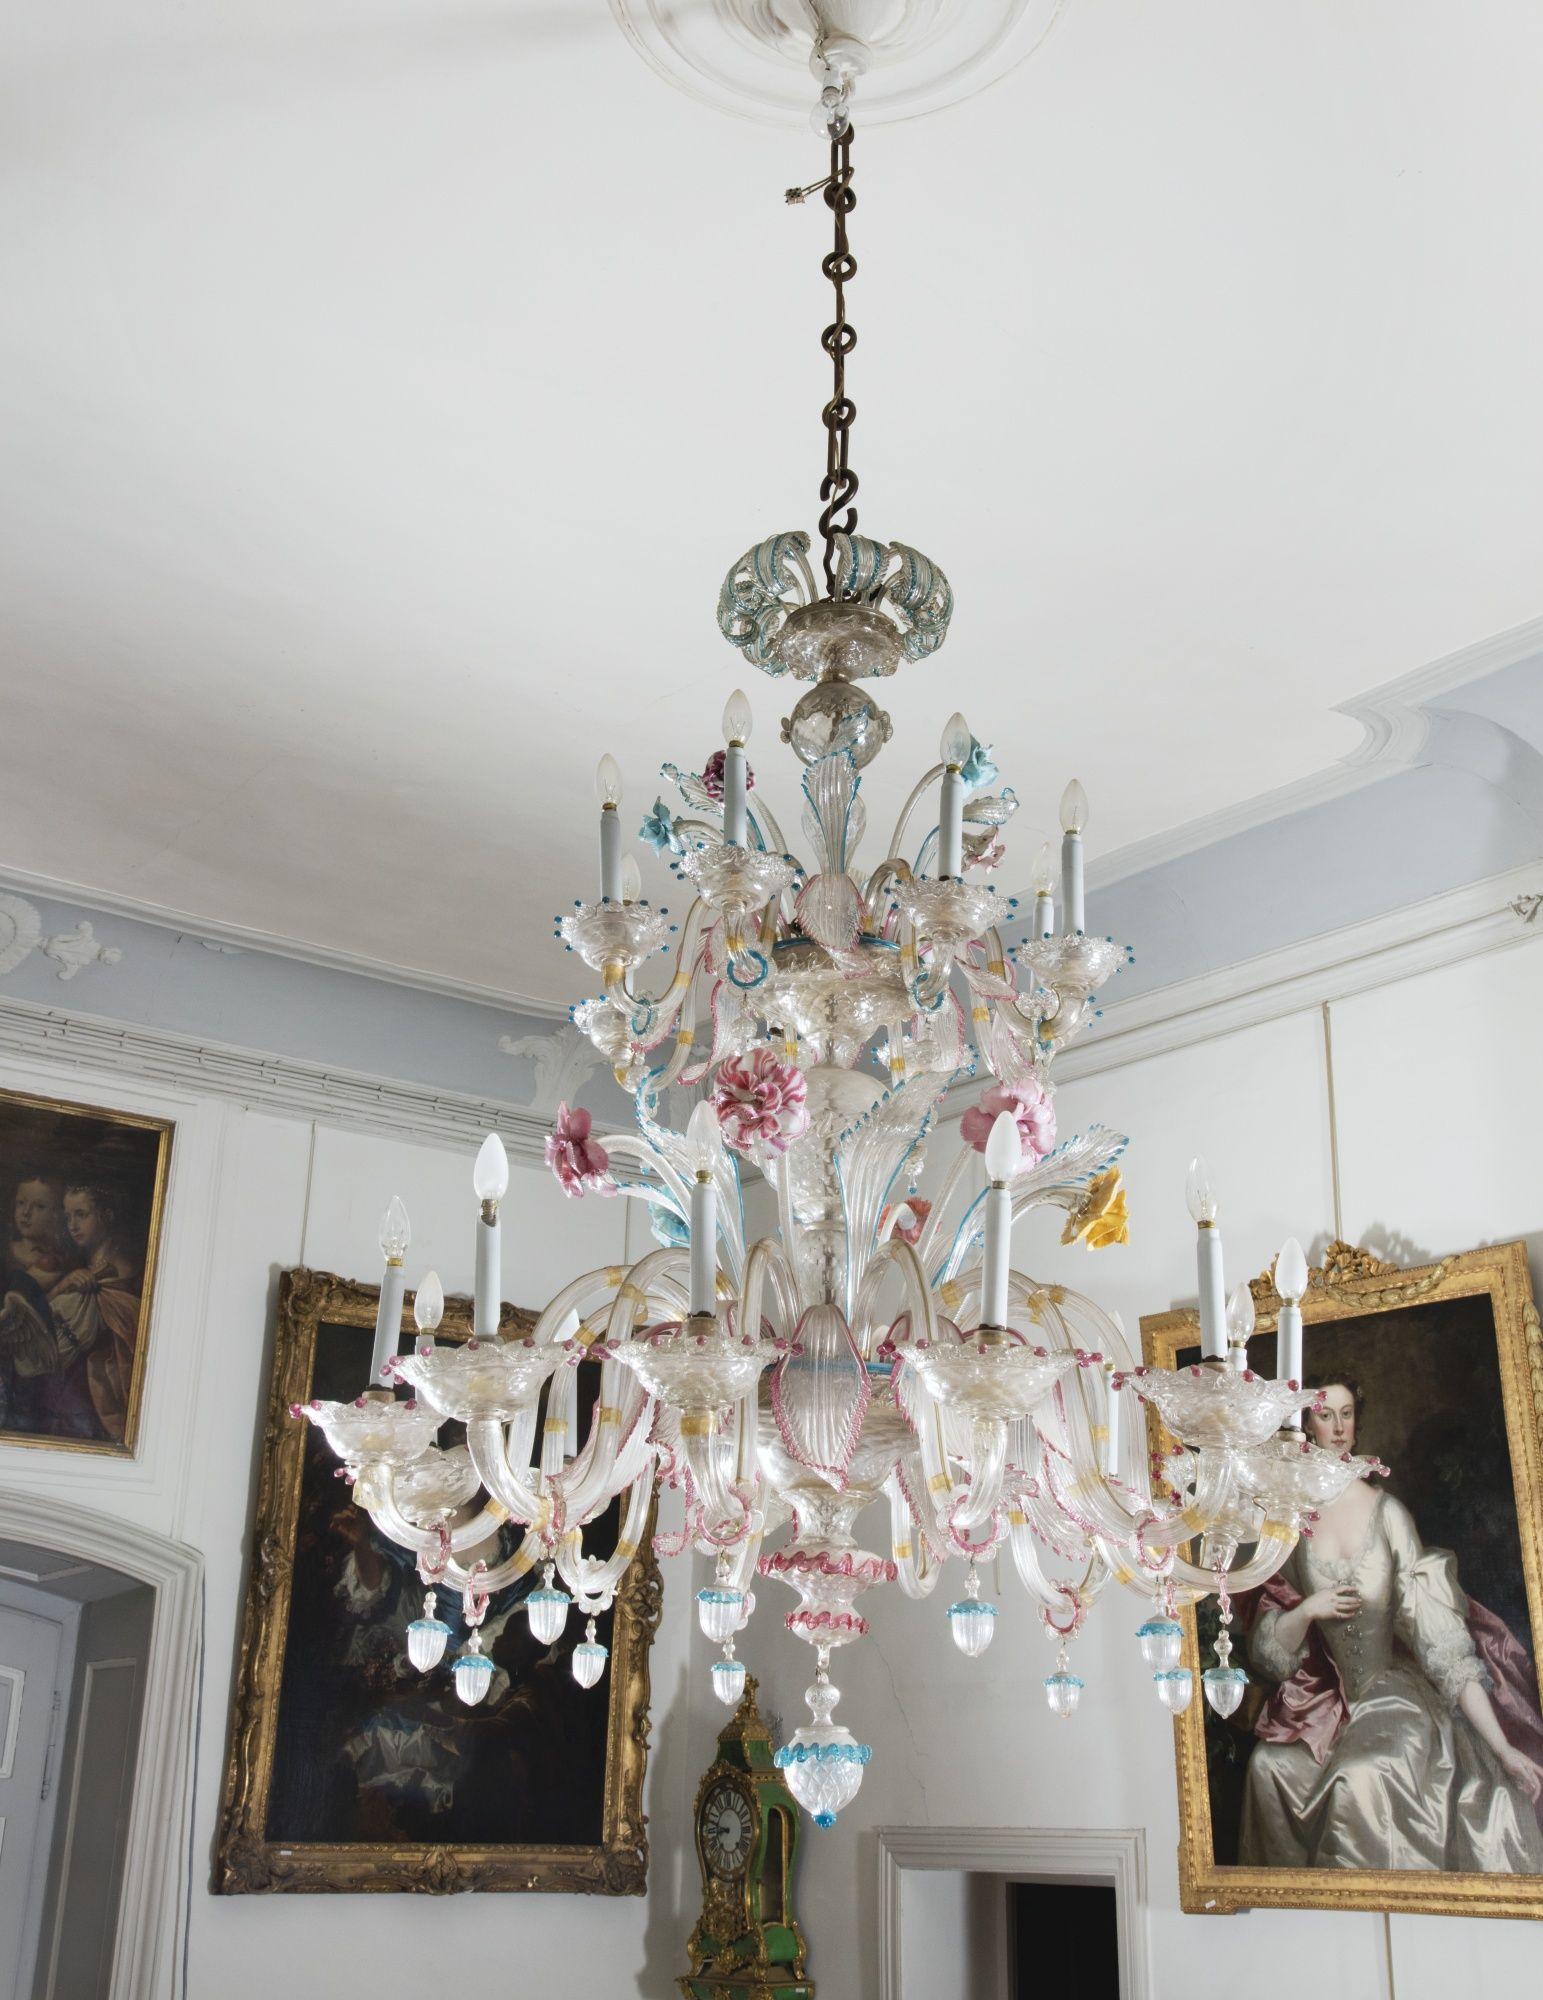 A VENETIAN TWENTY-LIGHTS MURANO GLASS CHANDELIER, LATE 19TH CENTURY - Antique Murano Chandeliers Italian Antique Lighting Alhambra